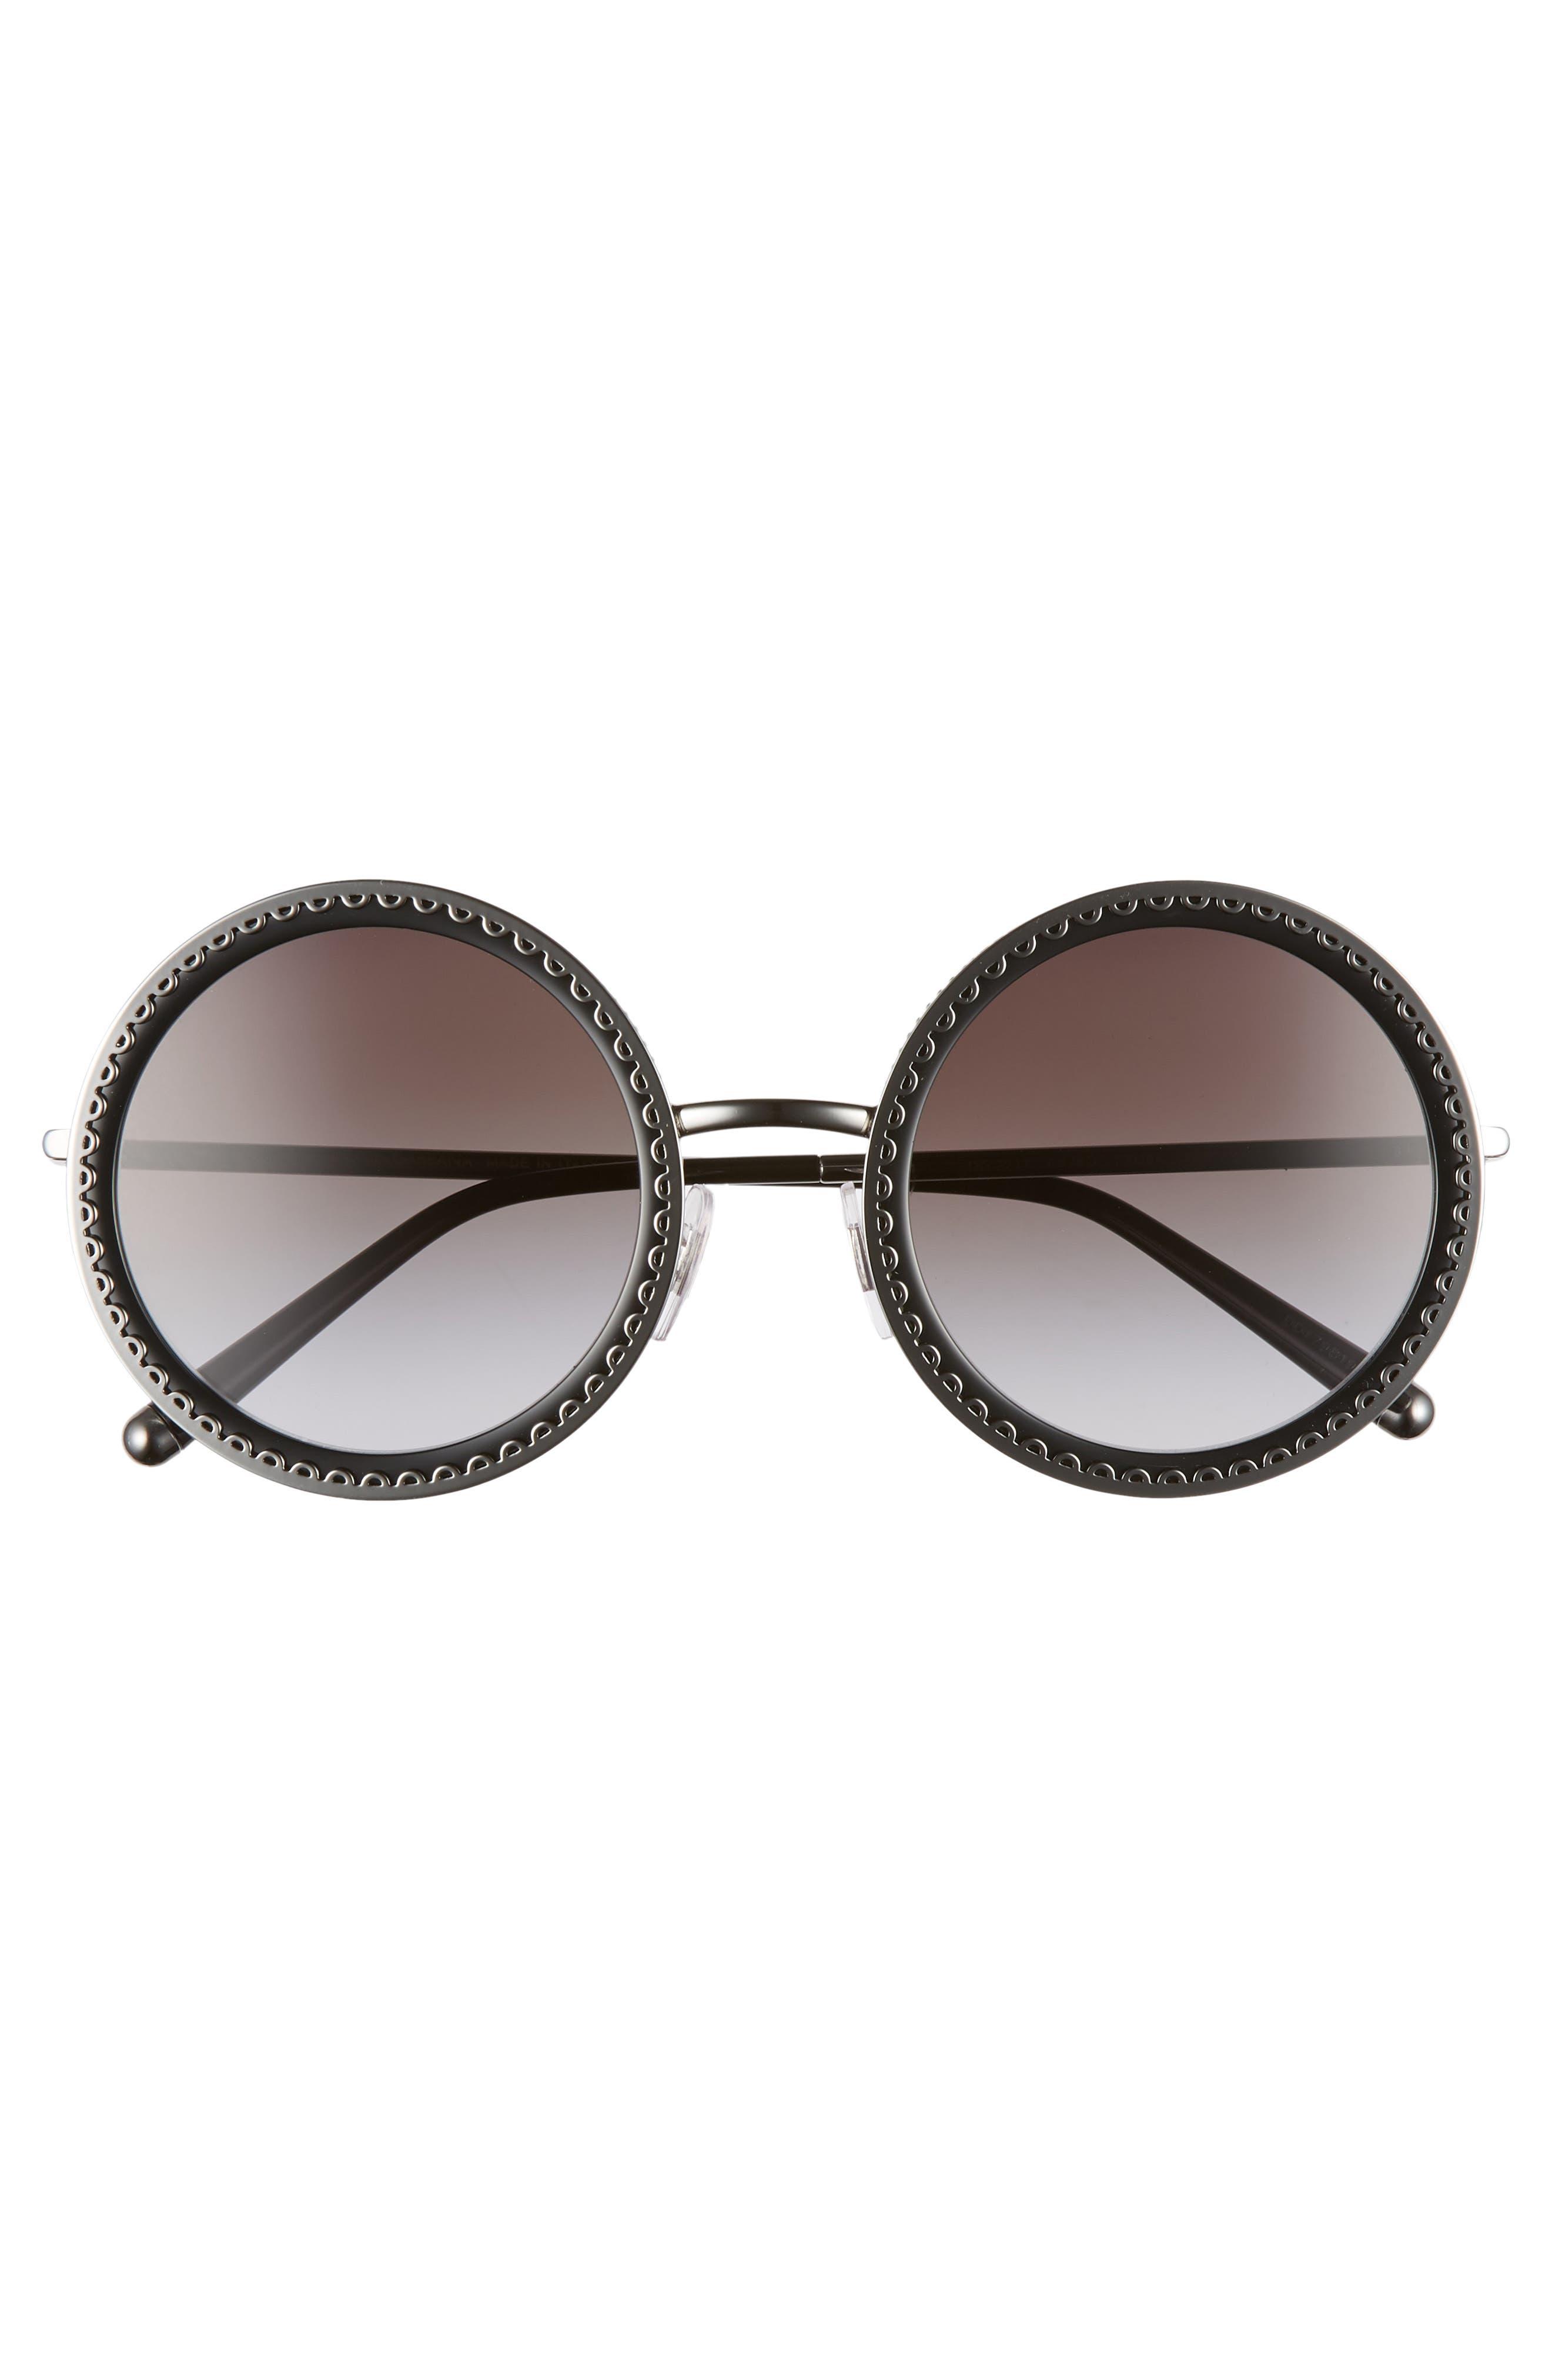 Sacred Heart 53mm Gradient Round Sunglasses,                             Alternate thumbnail 3, color,                             DARK GUNMETAL GRADIENT